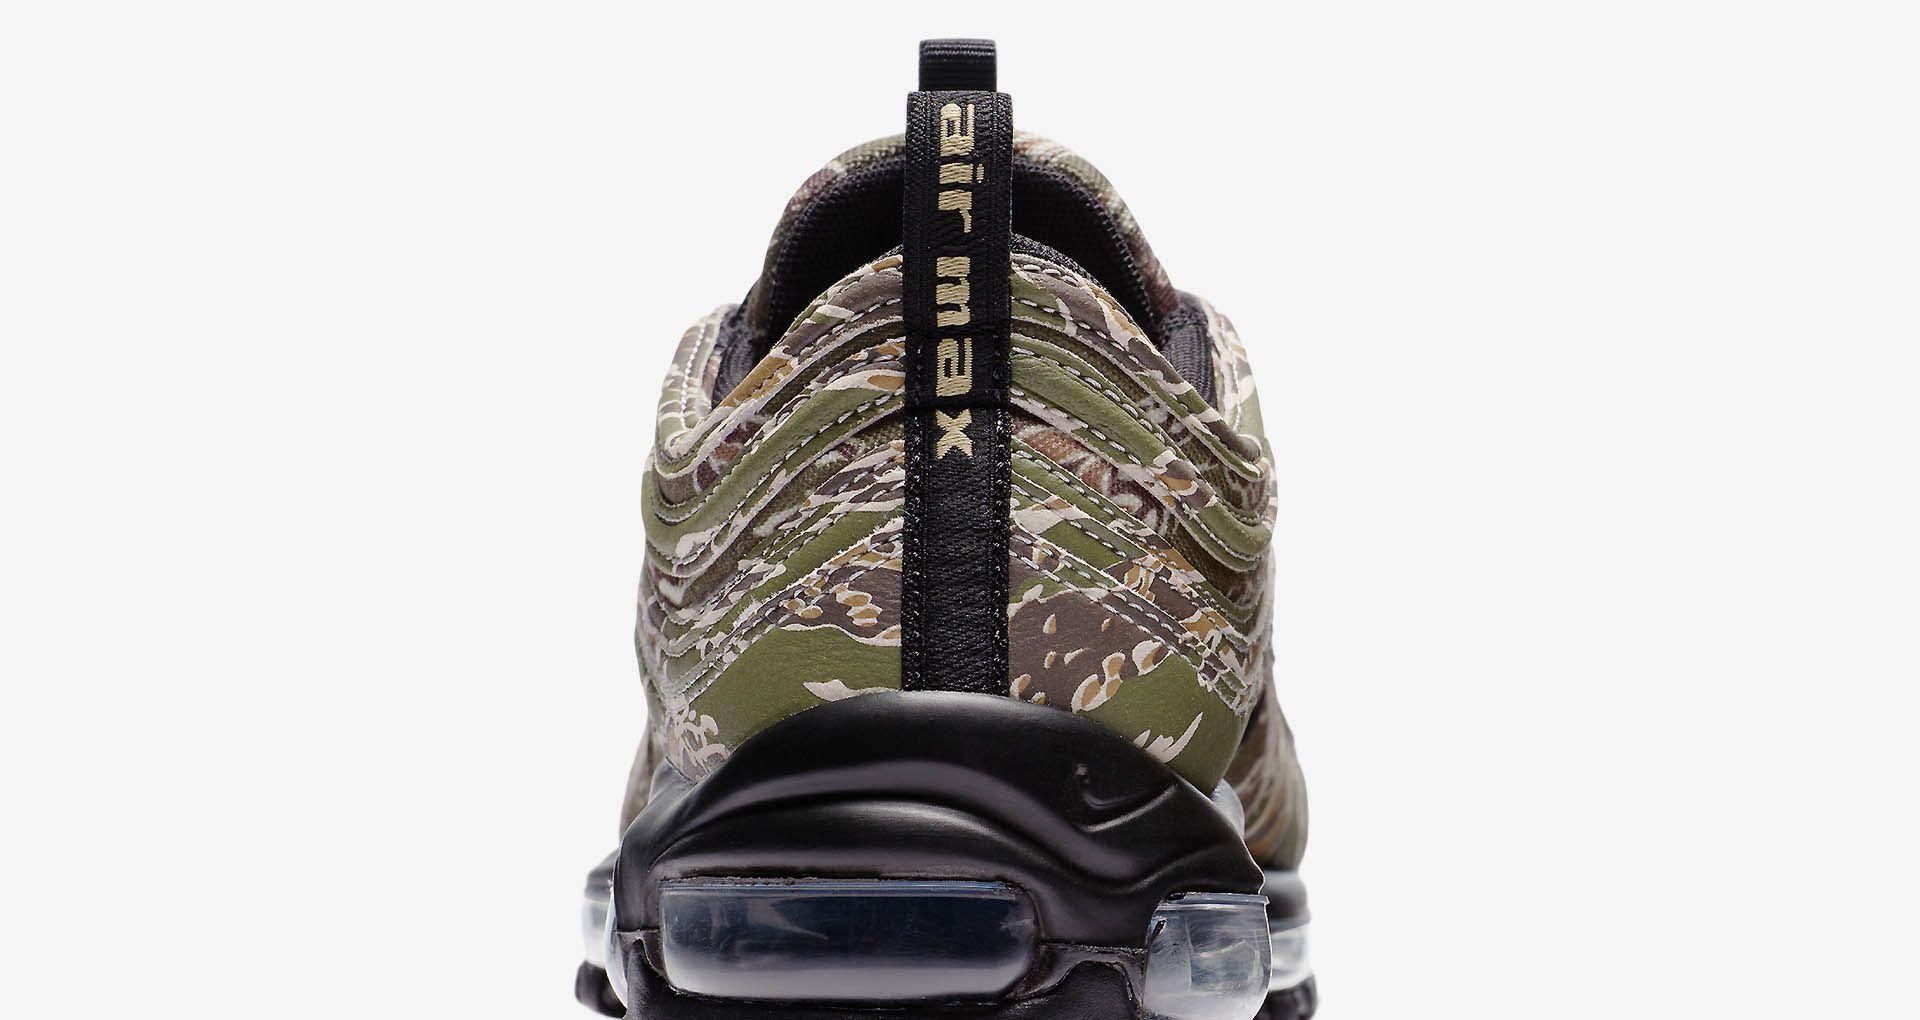 Nike Air Max 97 Premium Camo 'USA' Release Date. Nike SNKRS